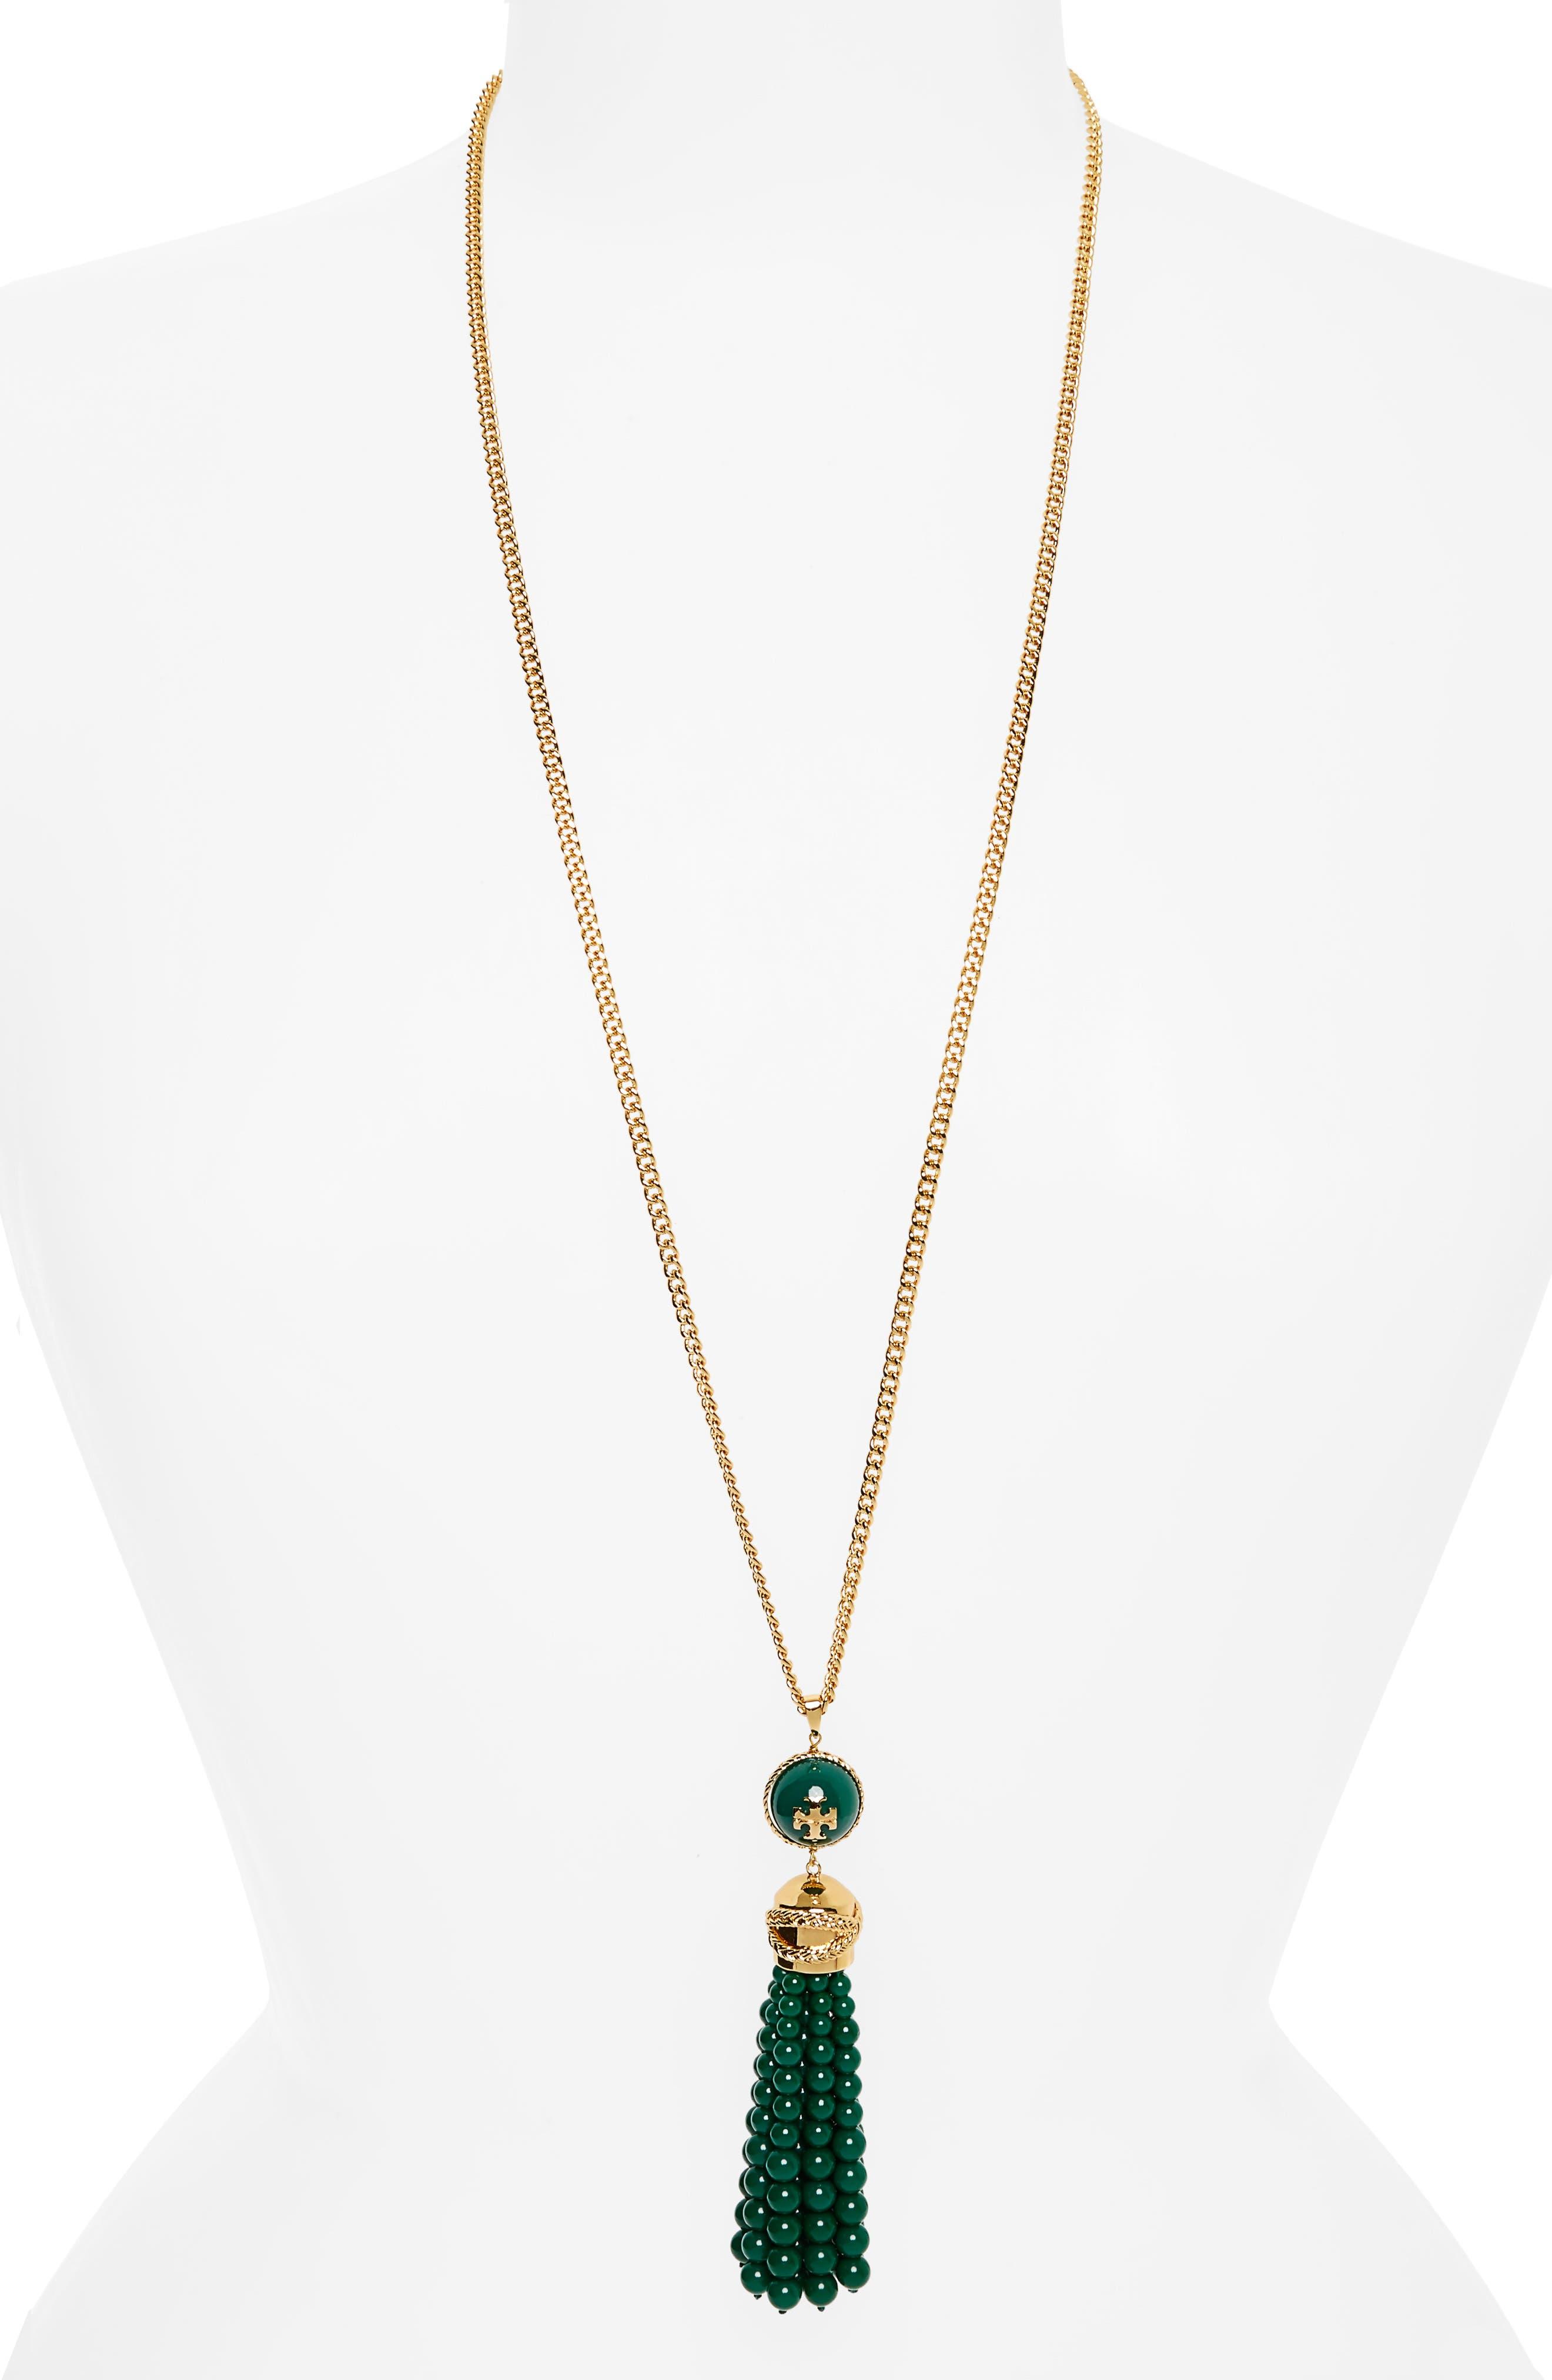 Tory Burch Beaded Tassel Necklace